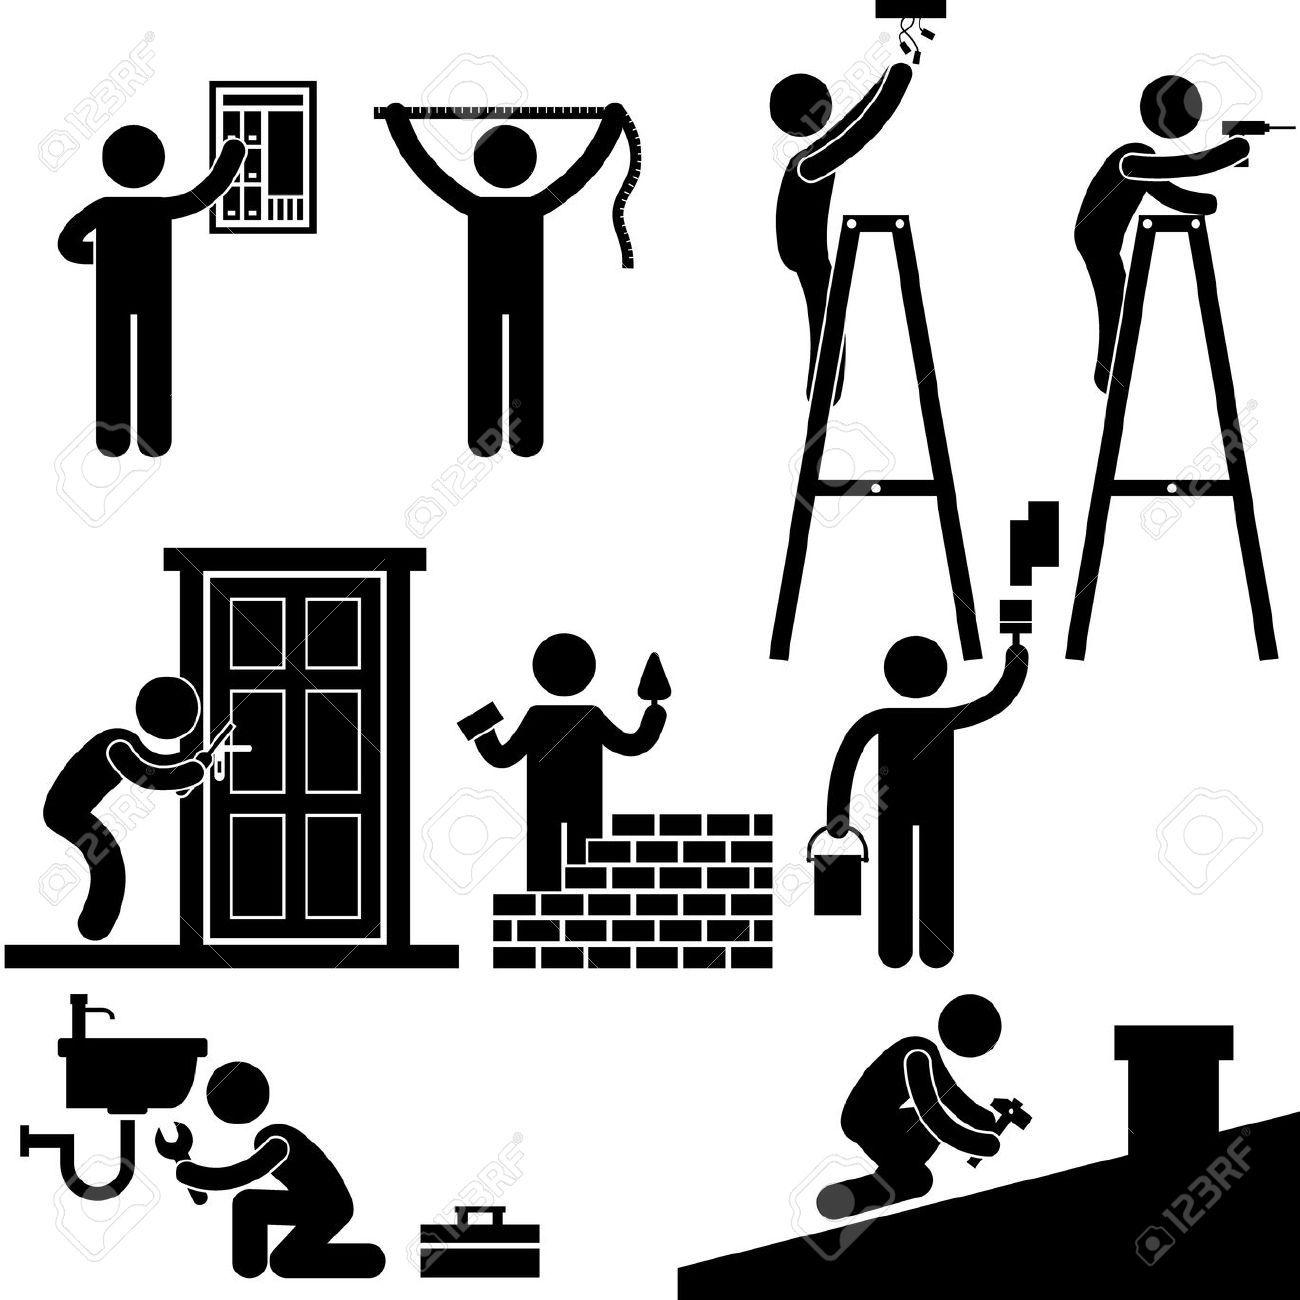 Mechanic clipart stick figure. Stock vector cartoon home